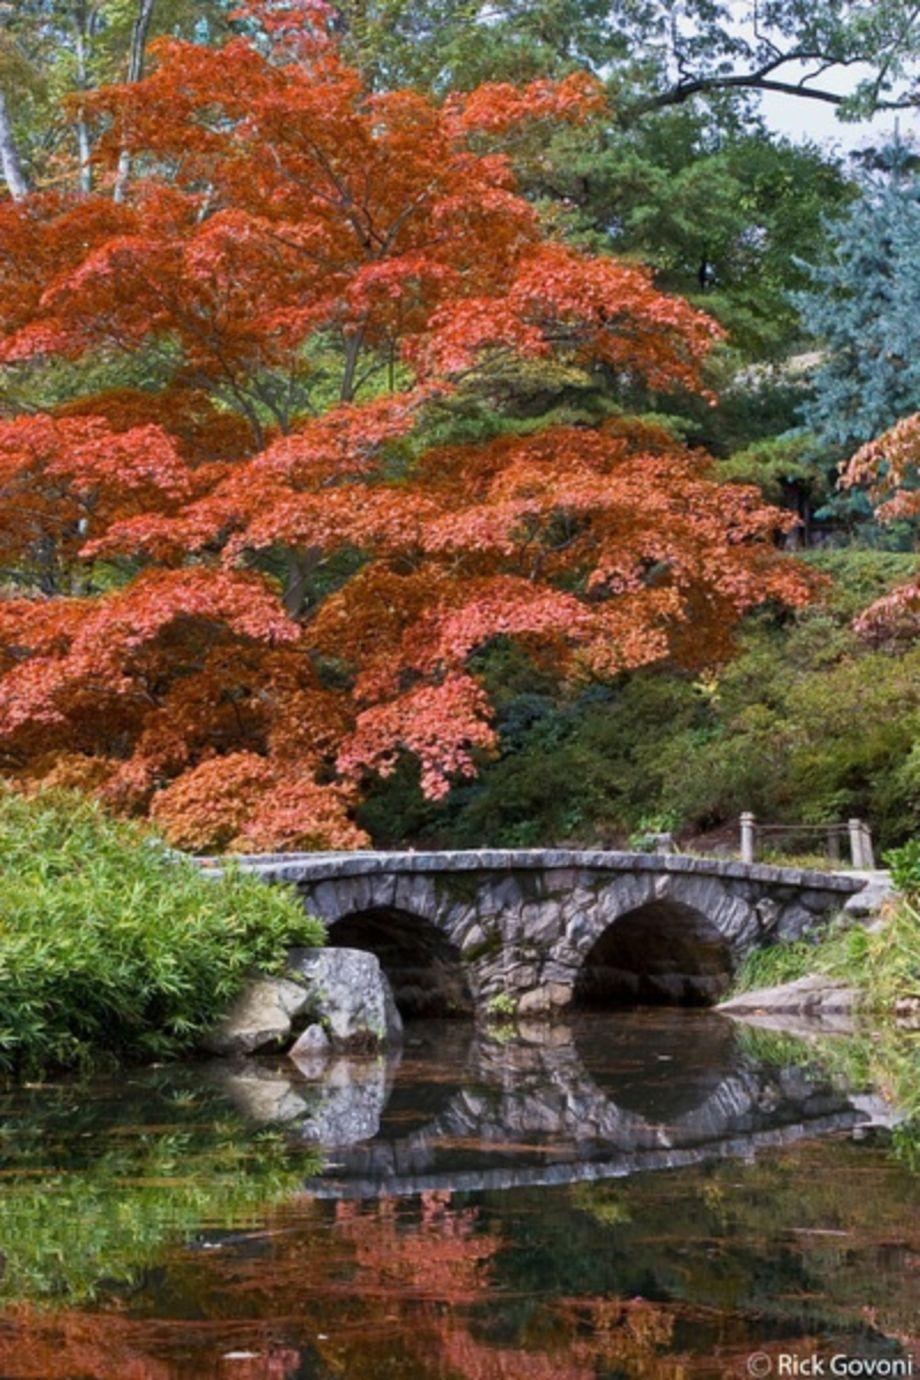 28 Japanese Garden Design Ideas To Style Up Your Backyard: Stunning Japanese Garden Ideas Plants You Will Love 33